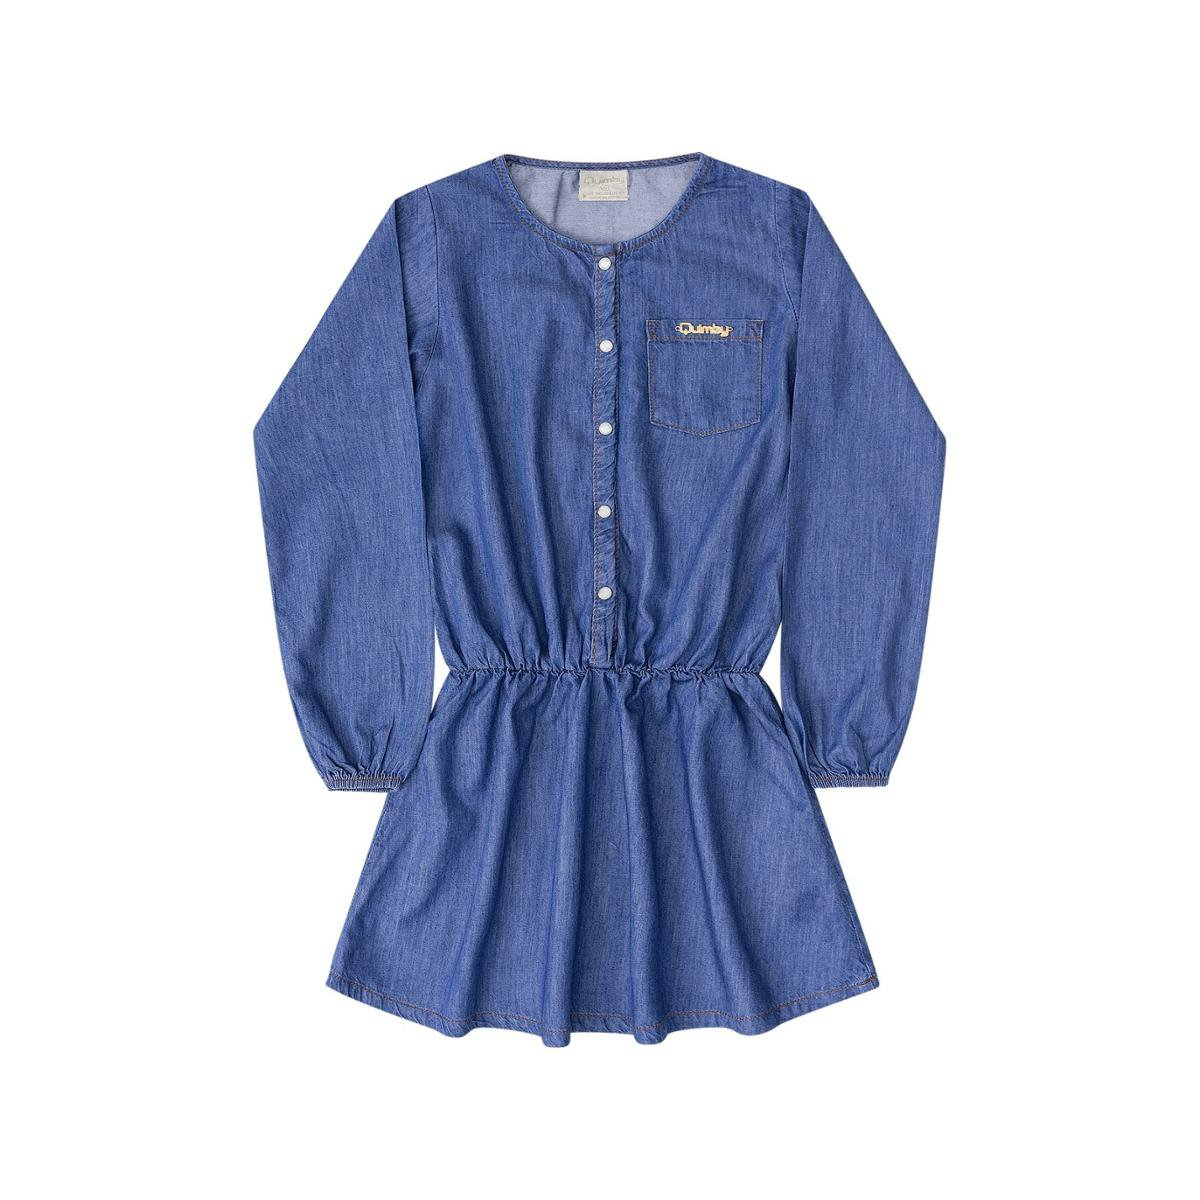 Vestido Jeans Manga Longa Infantil Quimby Feminino - Azul Escuro ... 15e4bc81dda